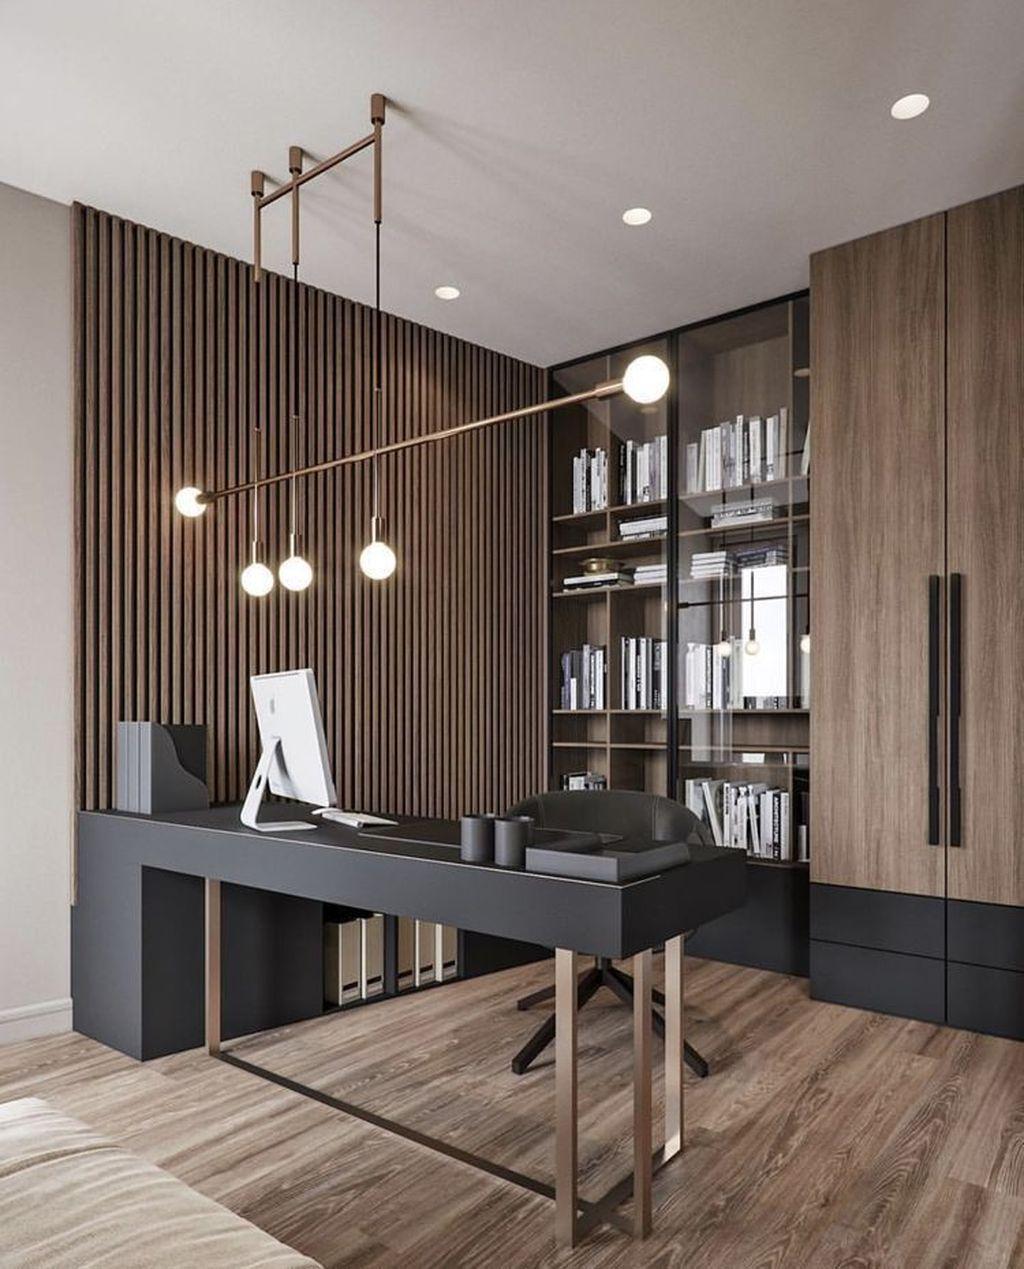 Admirable Modern Interior Design Ideas You Never Seen Before 29